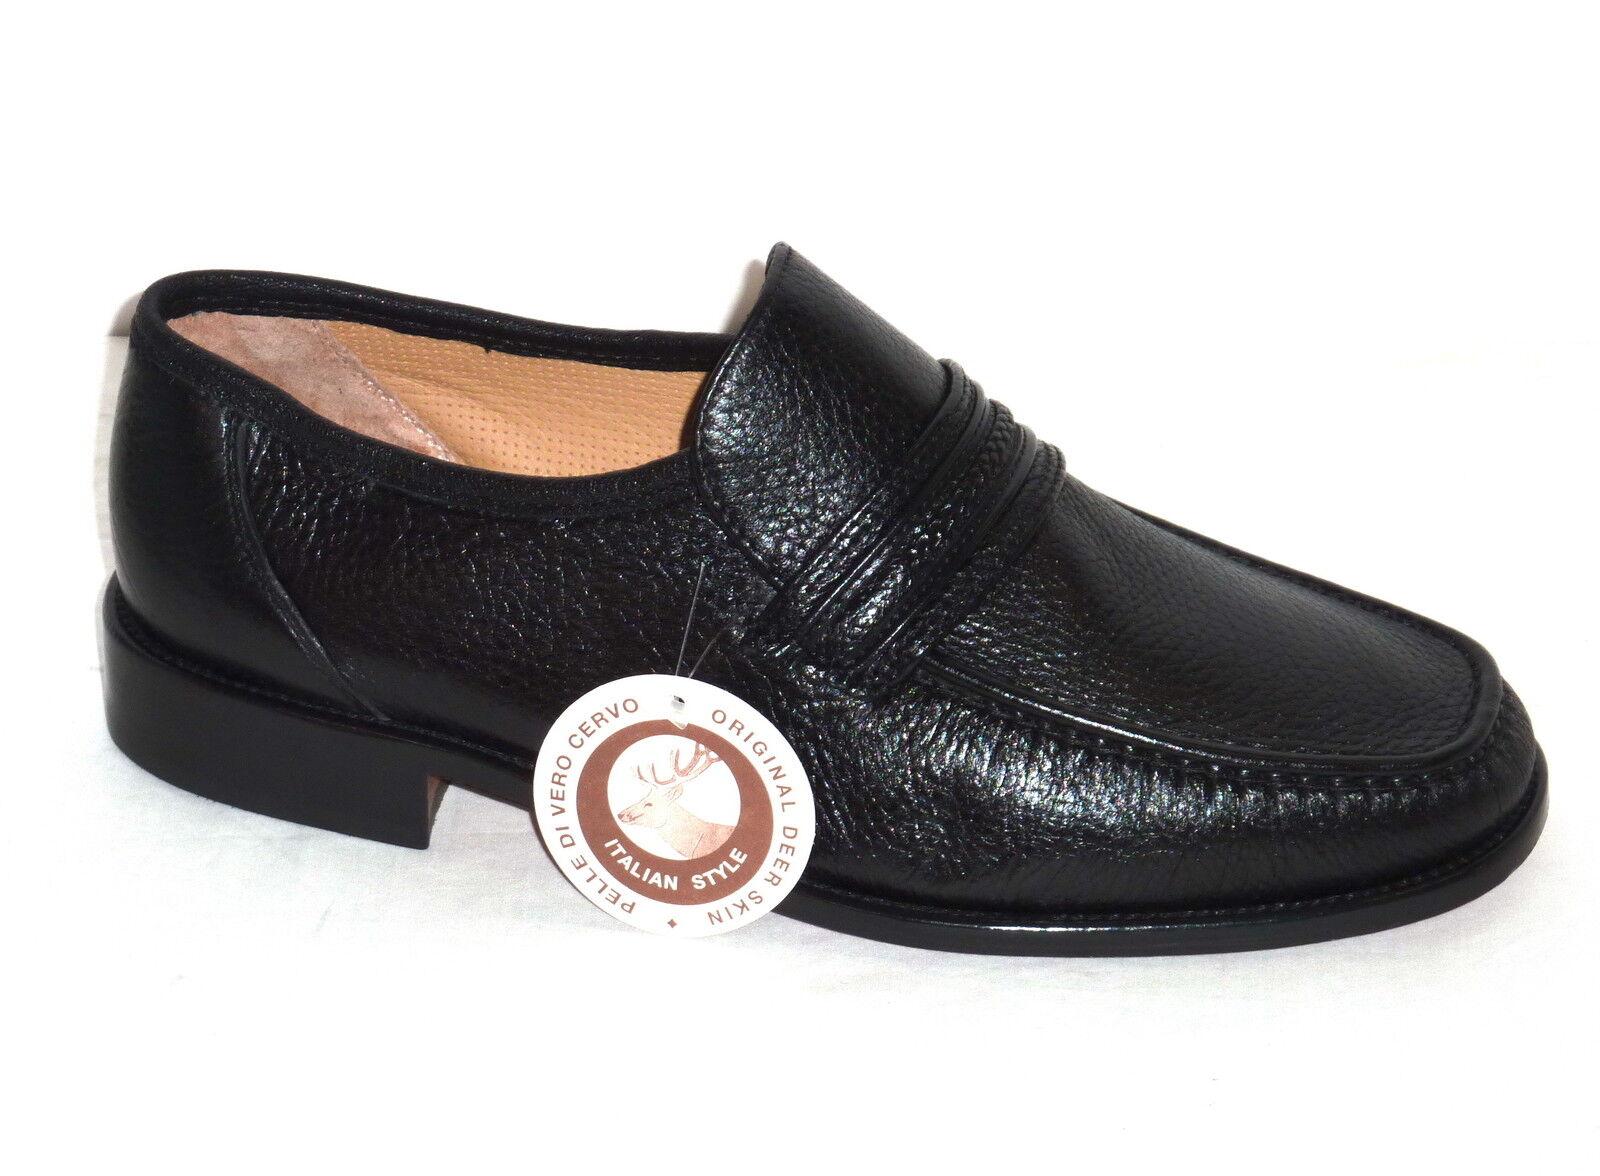 U4208H MELLUSO zapatos hombres MOCASSINI PELLE CERVO negro MODA COMODA n. 39